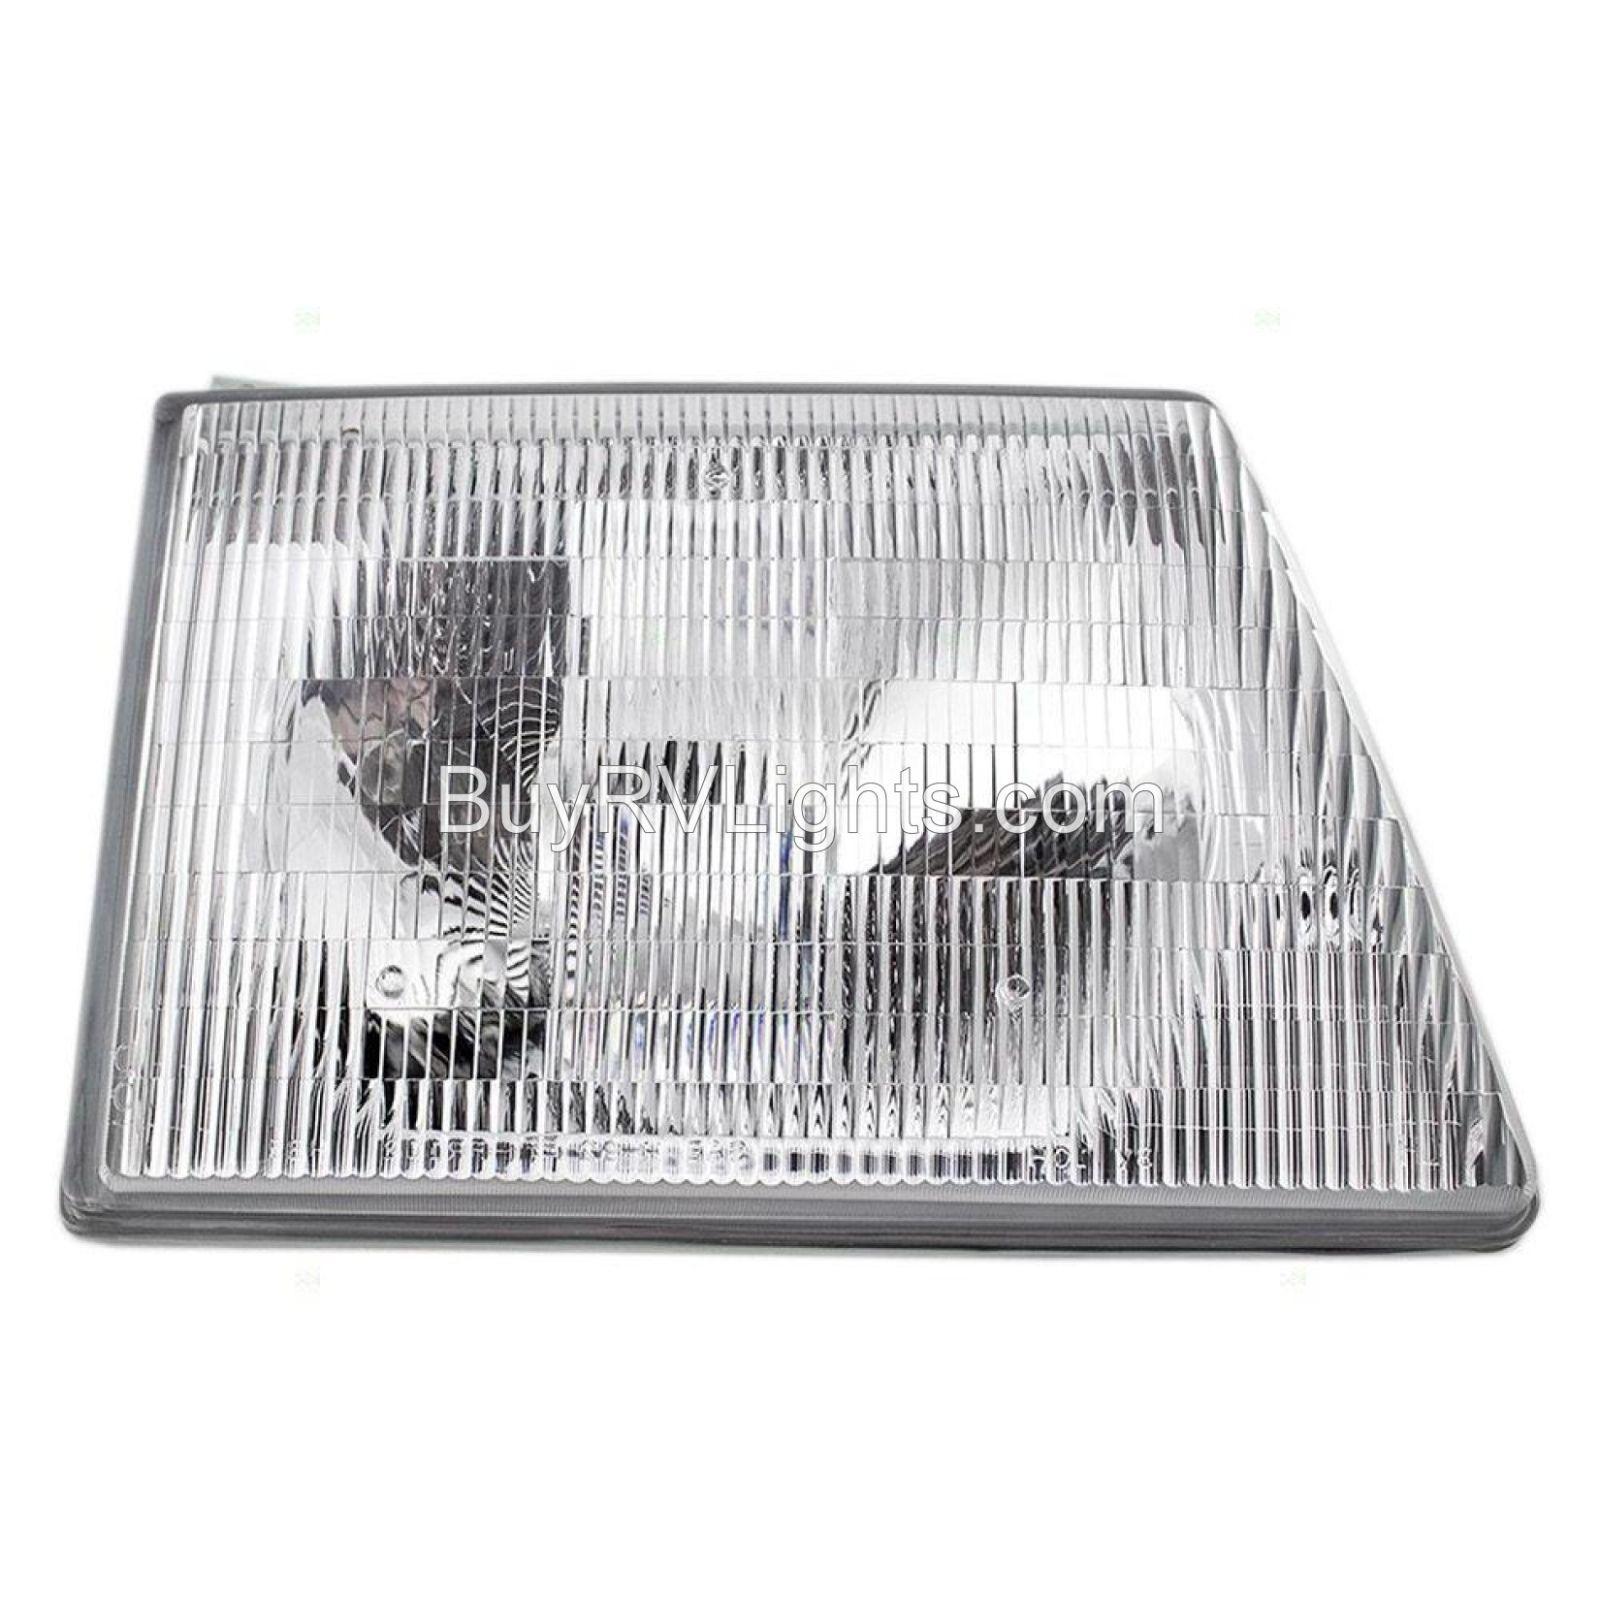 FLEETWOOD FIESTA RV 2002 2003 2004 PAIR HEADLIGHTS HEAD LIGHTS FRONT LAMPS NEW